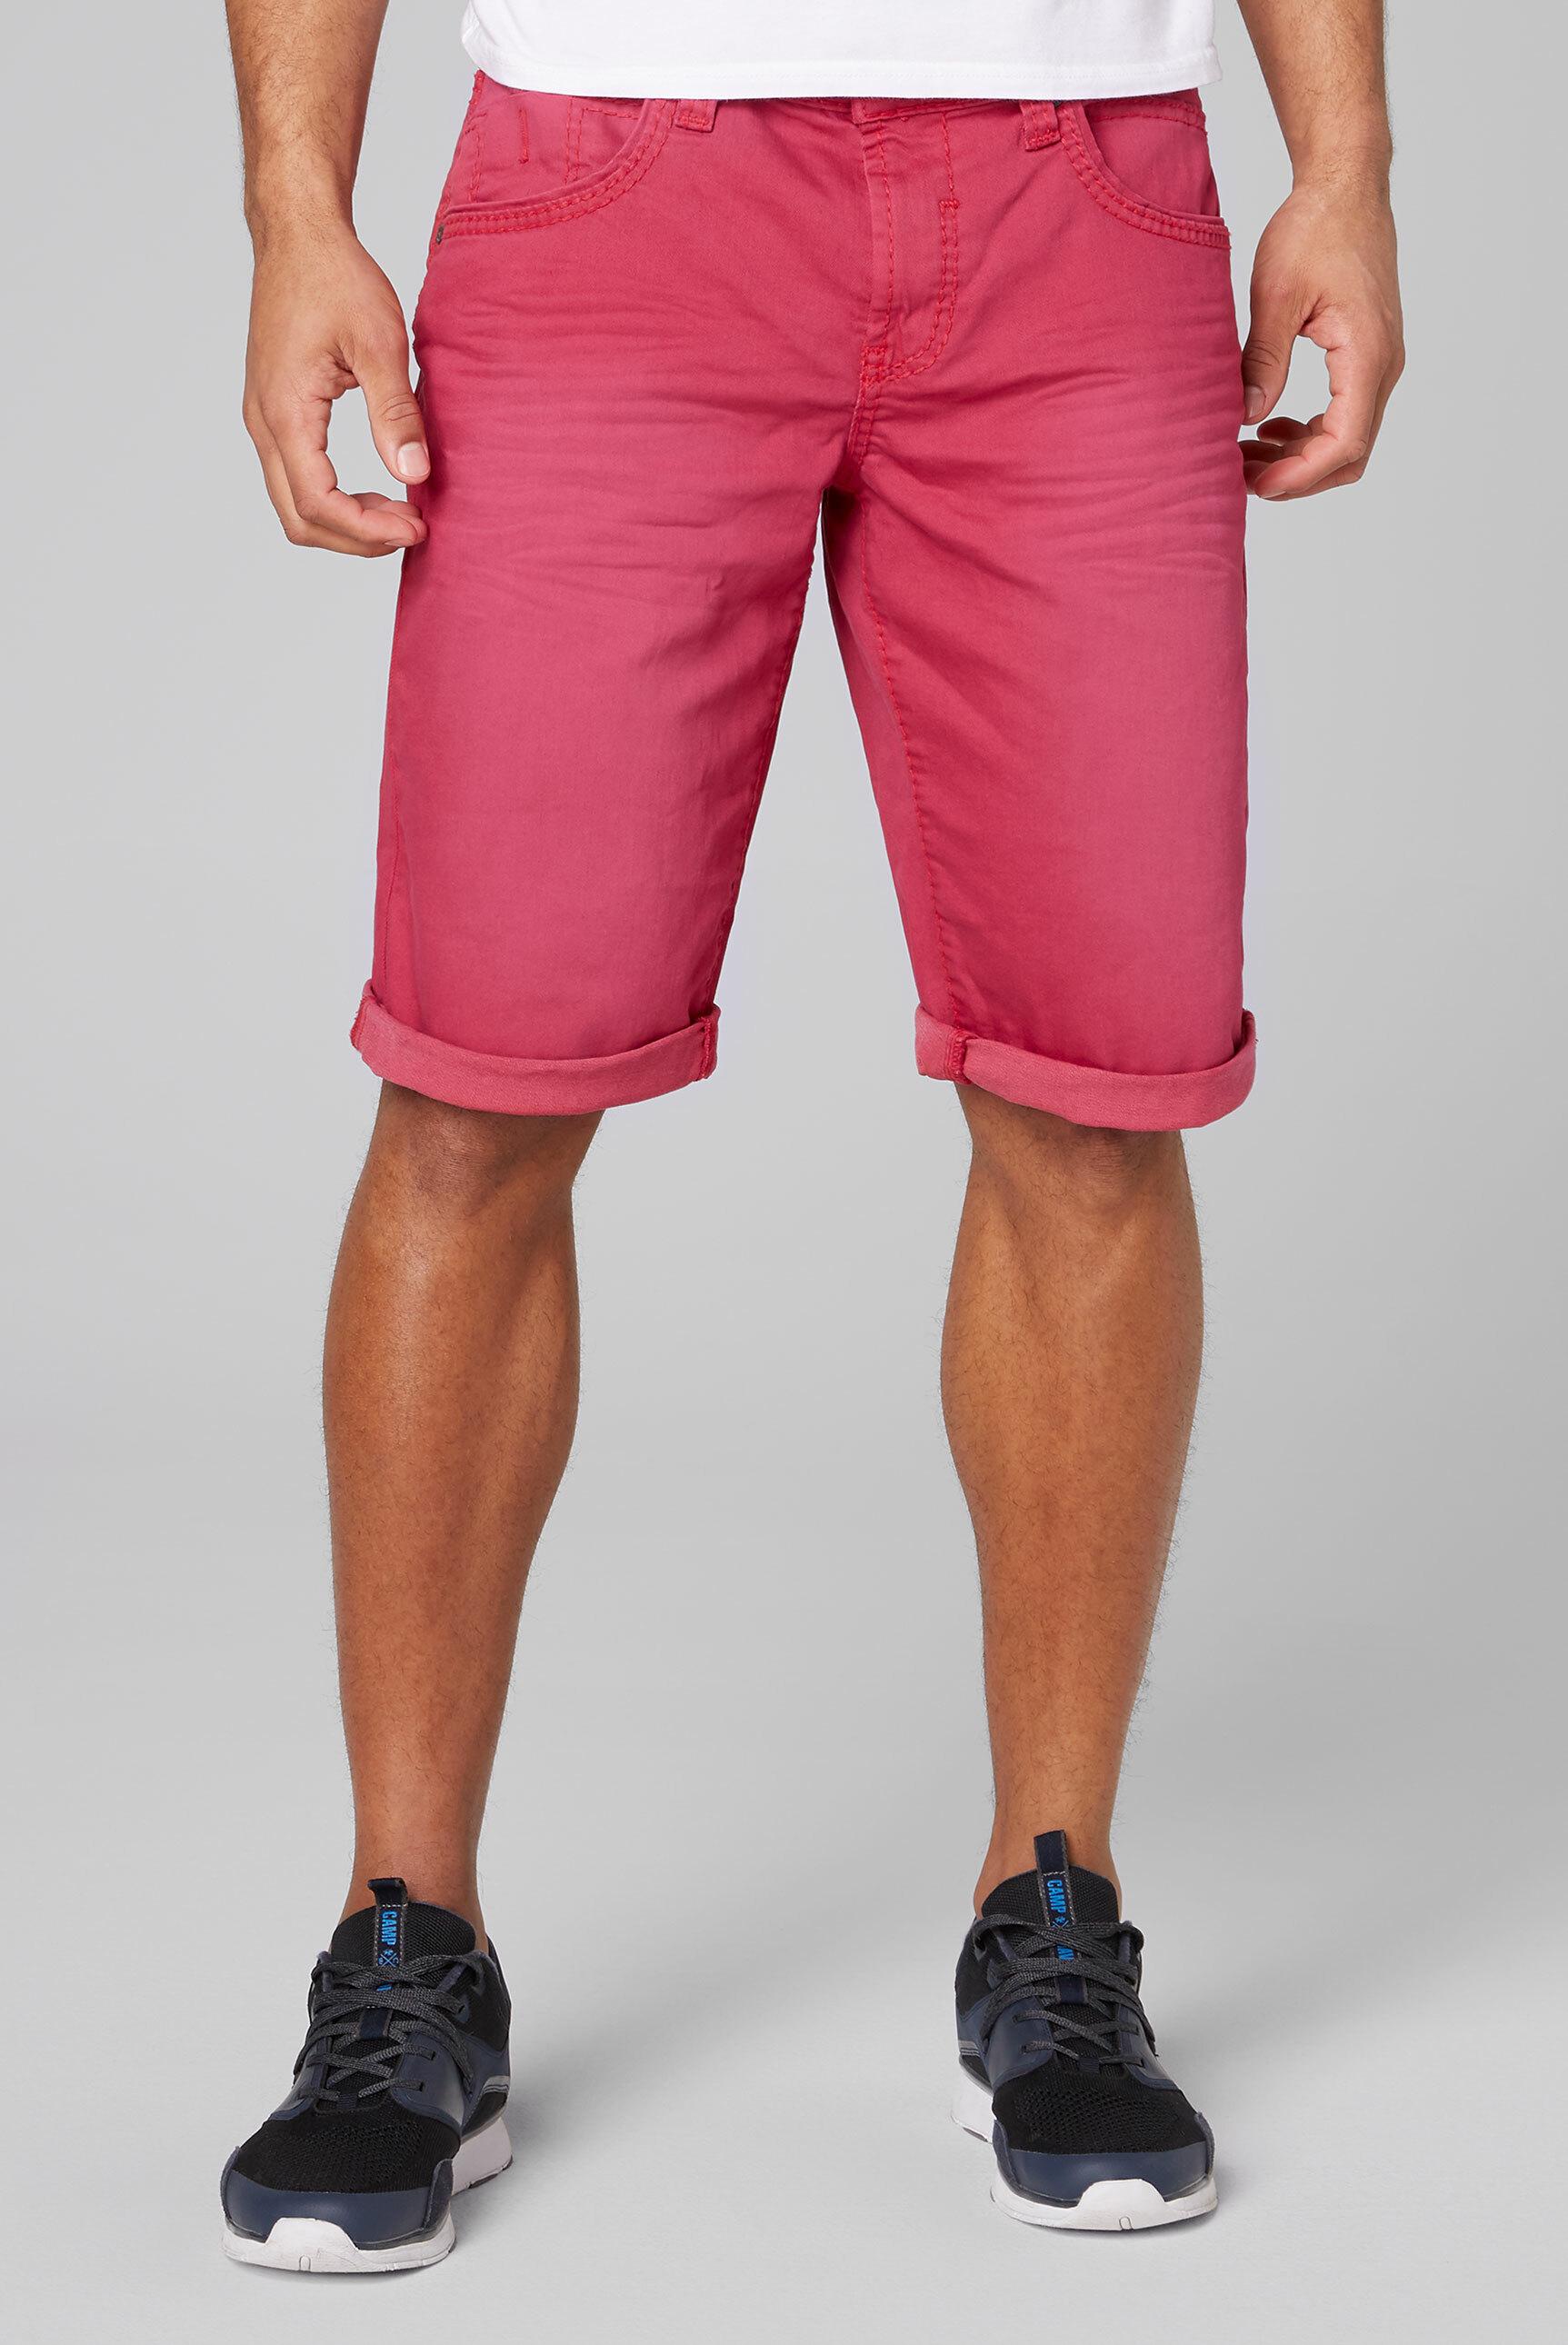 Coloured Skater Shorts RO:BI